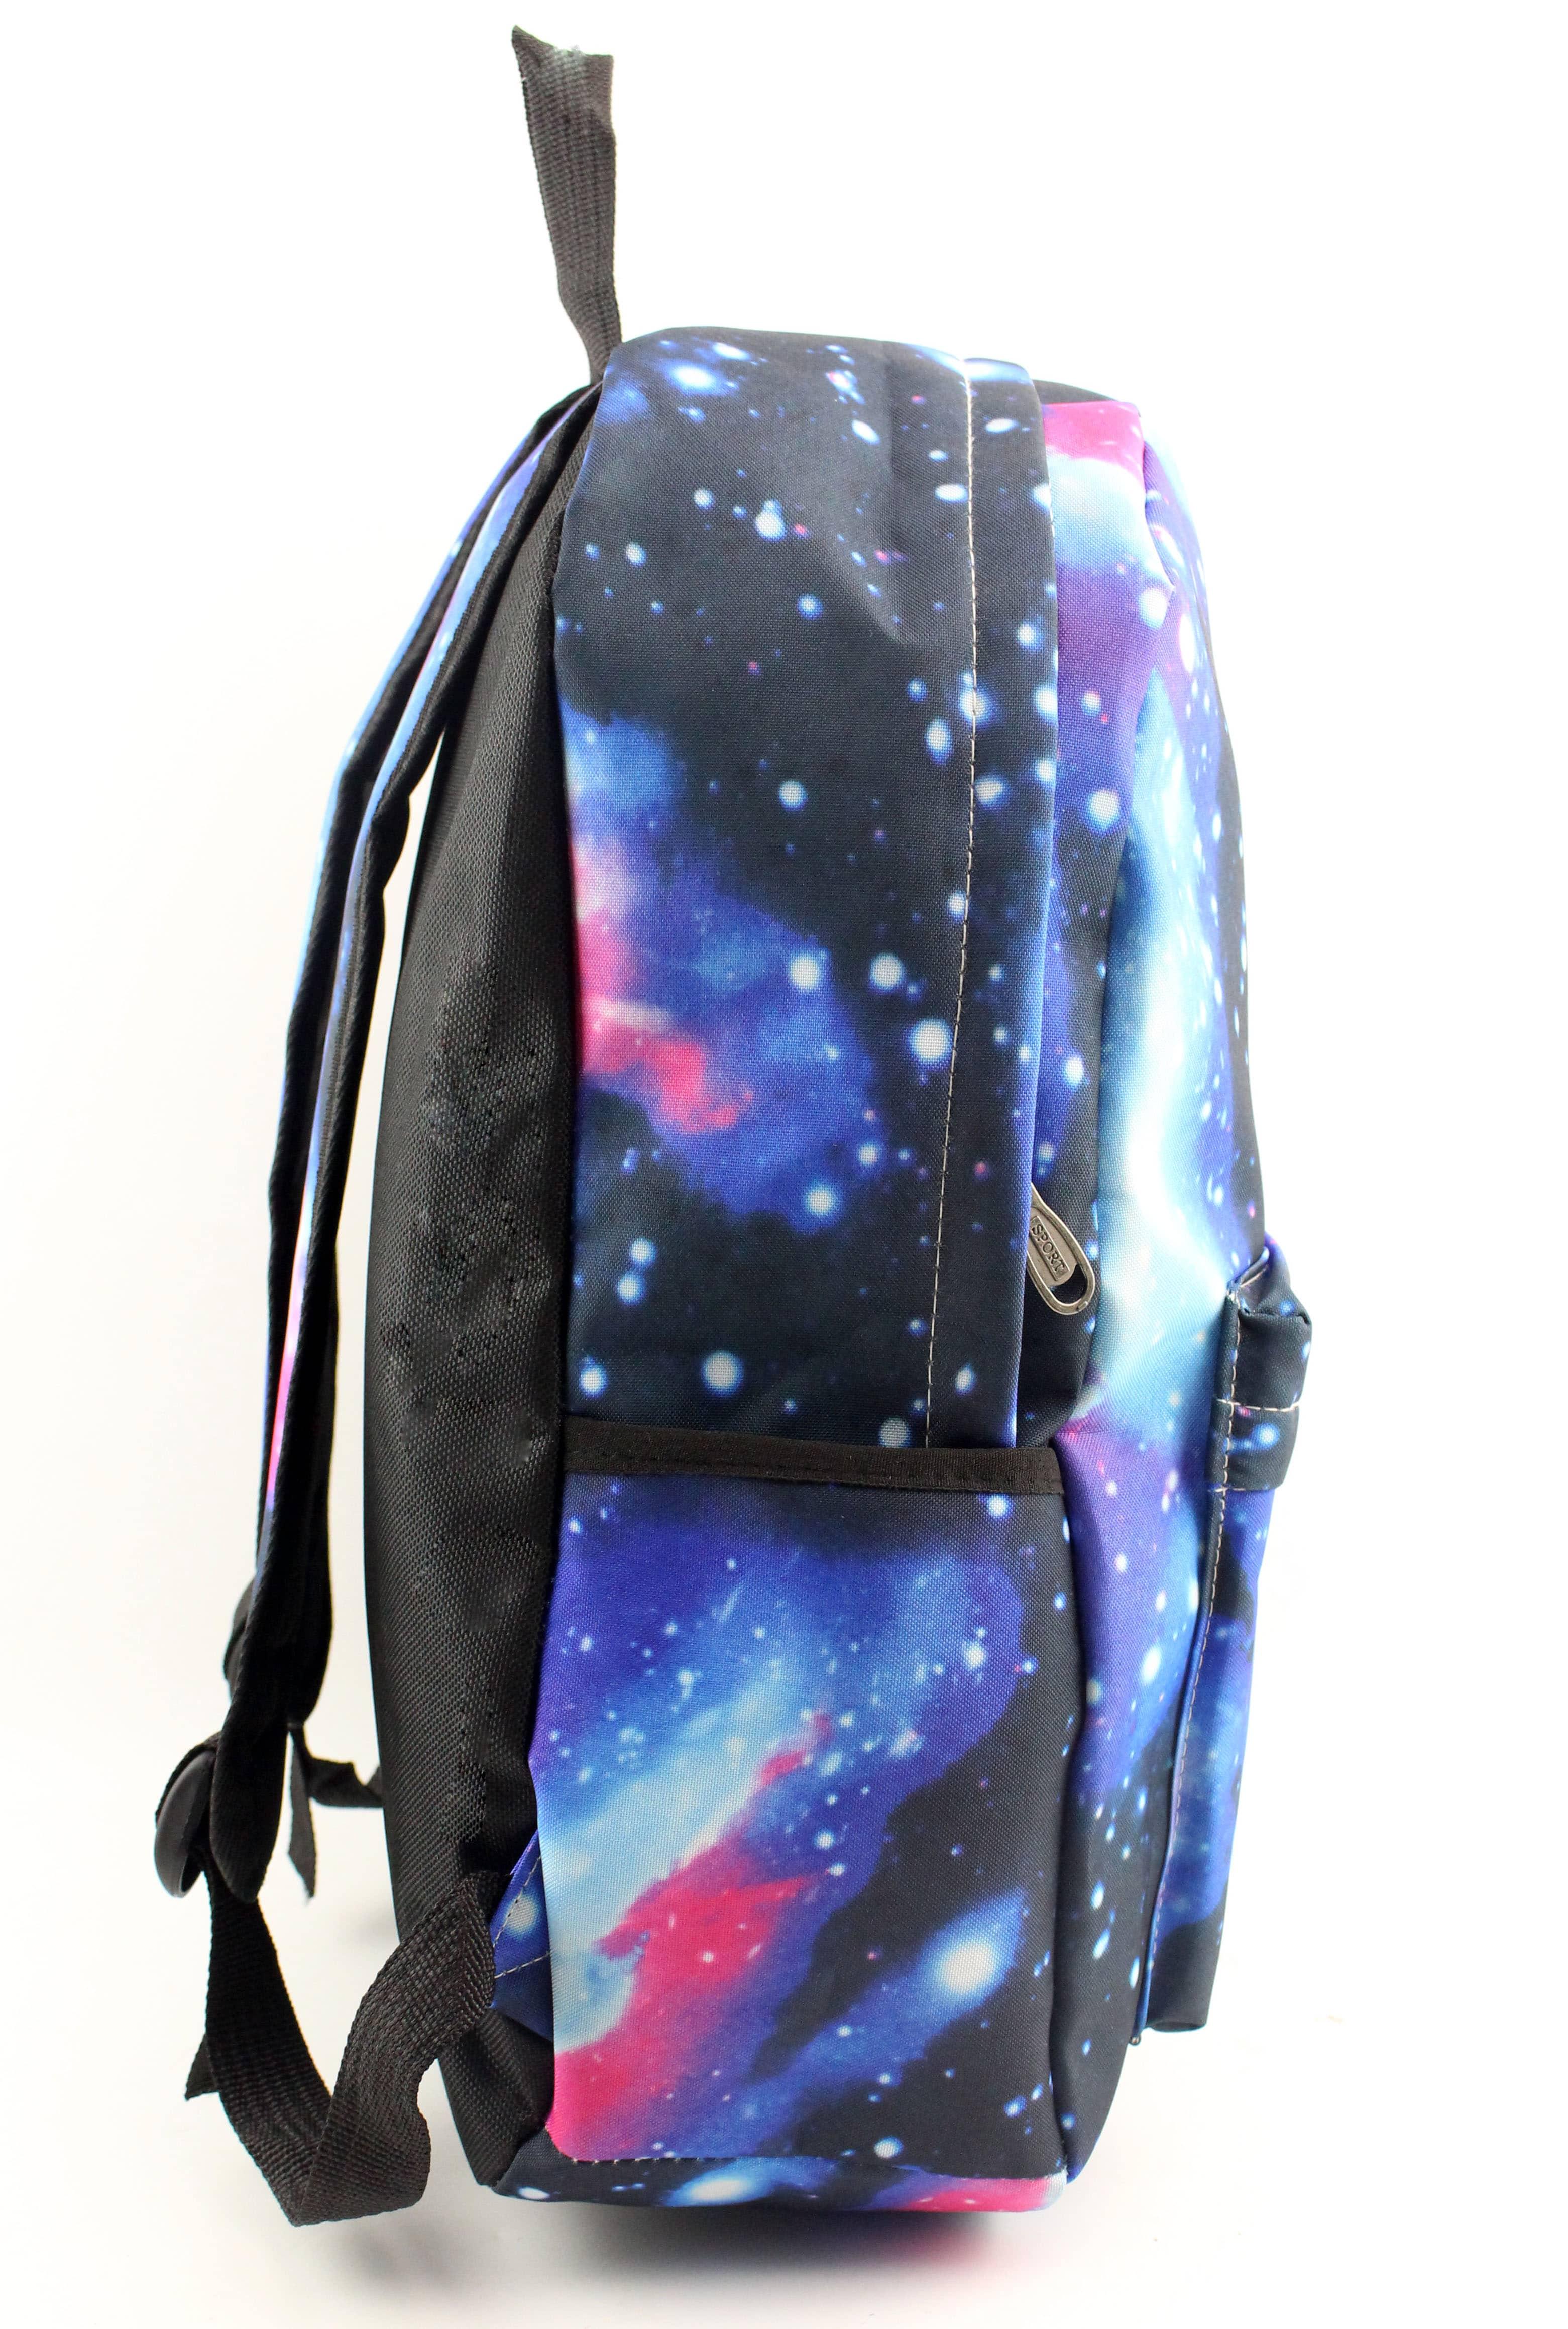 bag160728308_1